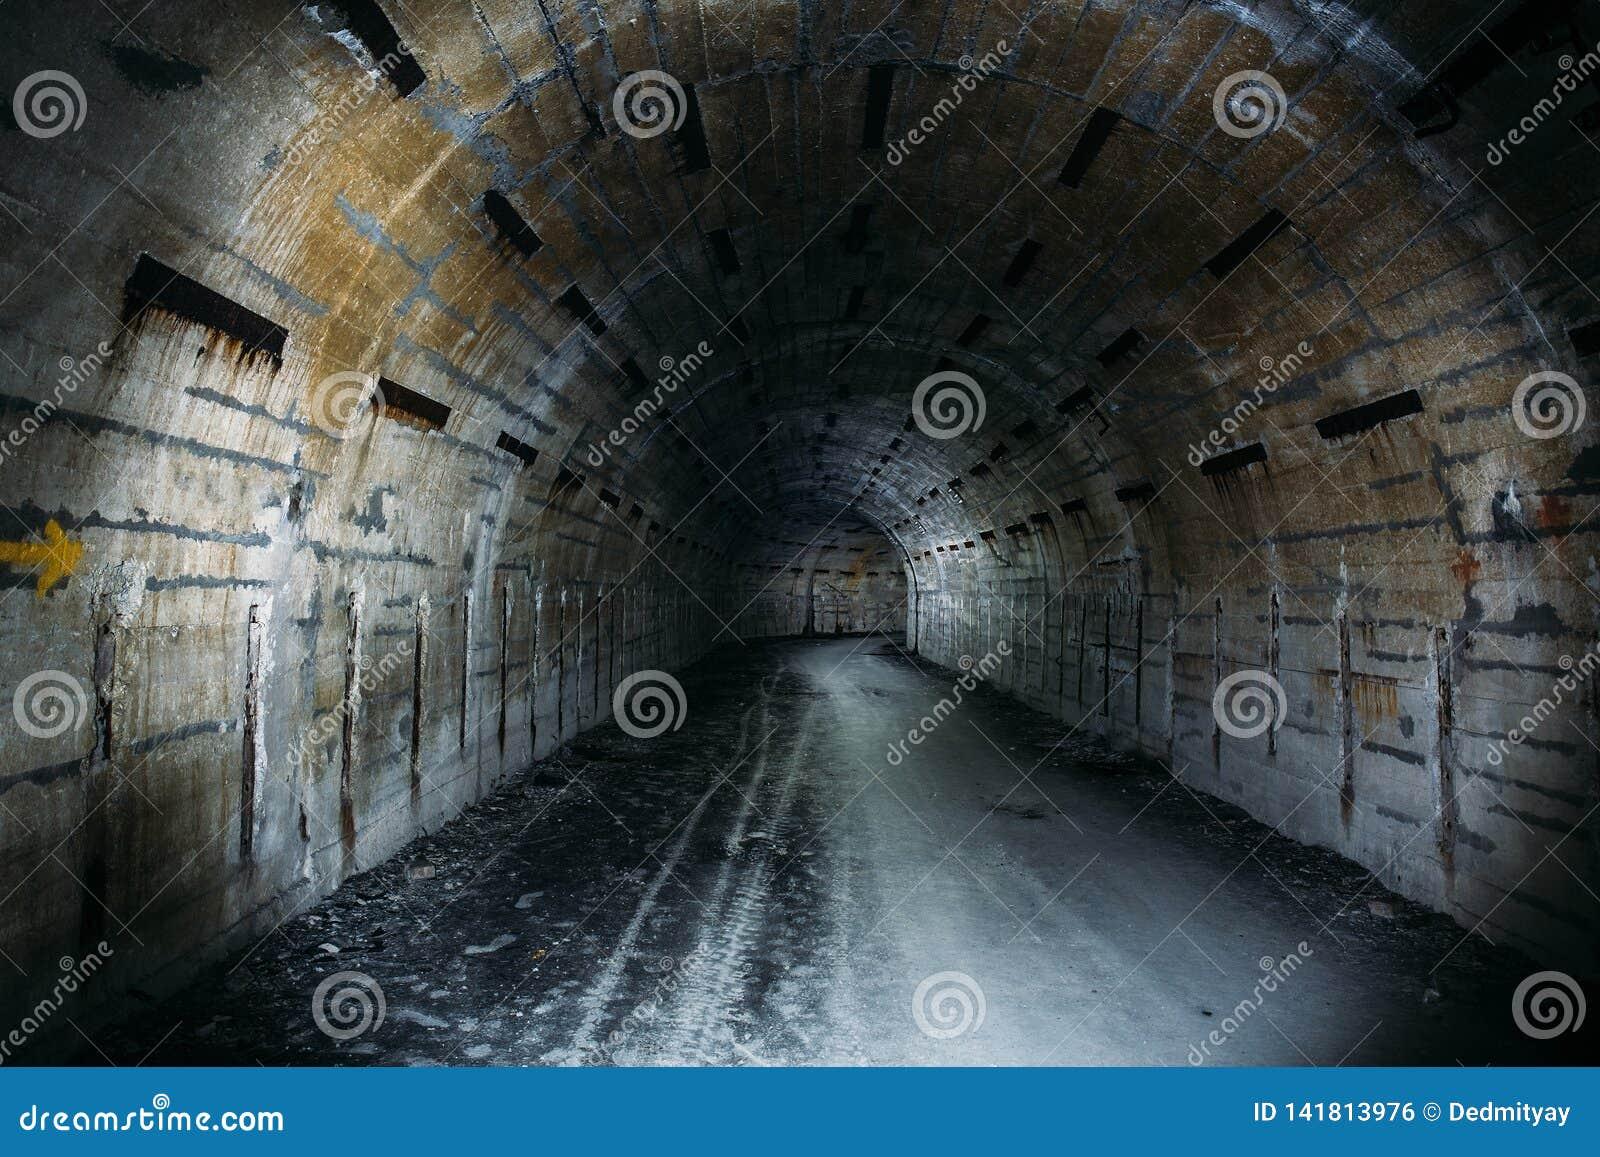 Long underground tunnel or corridor in abandoned Soviet military bunker